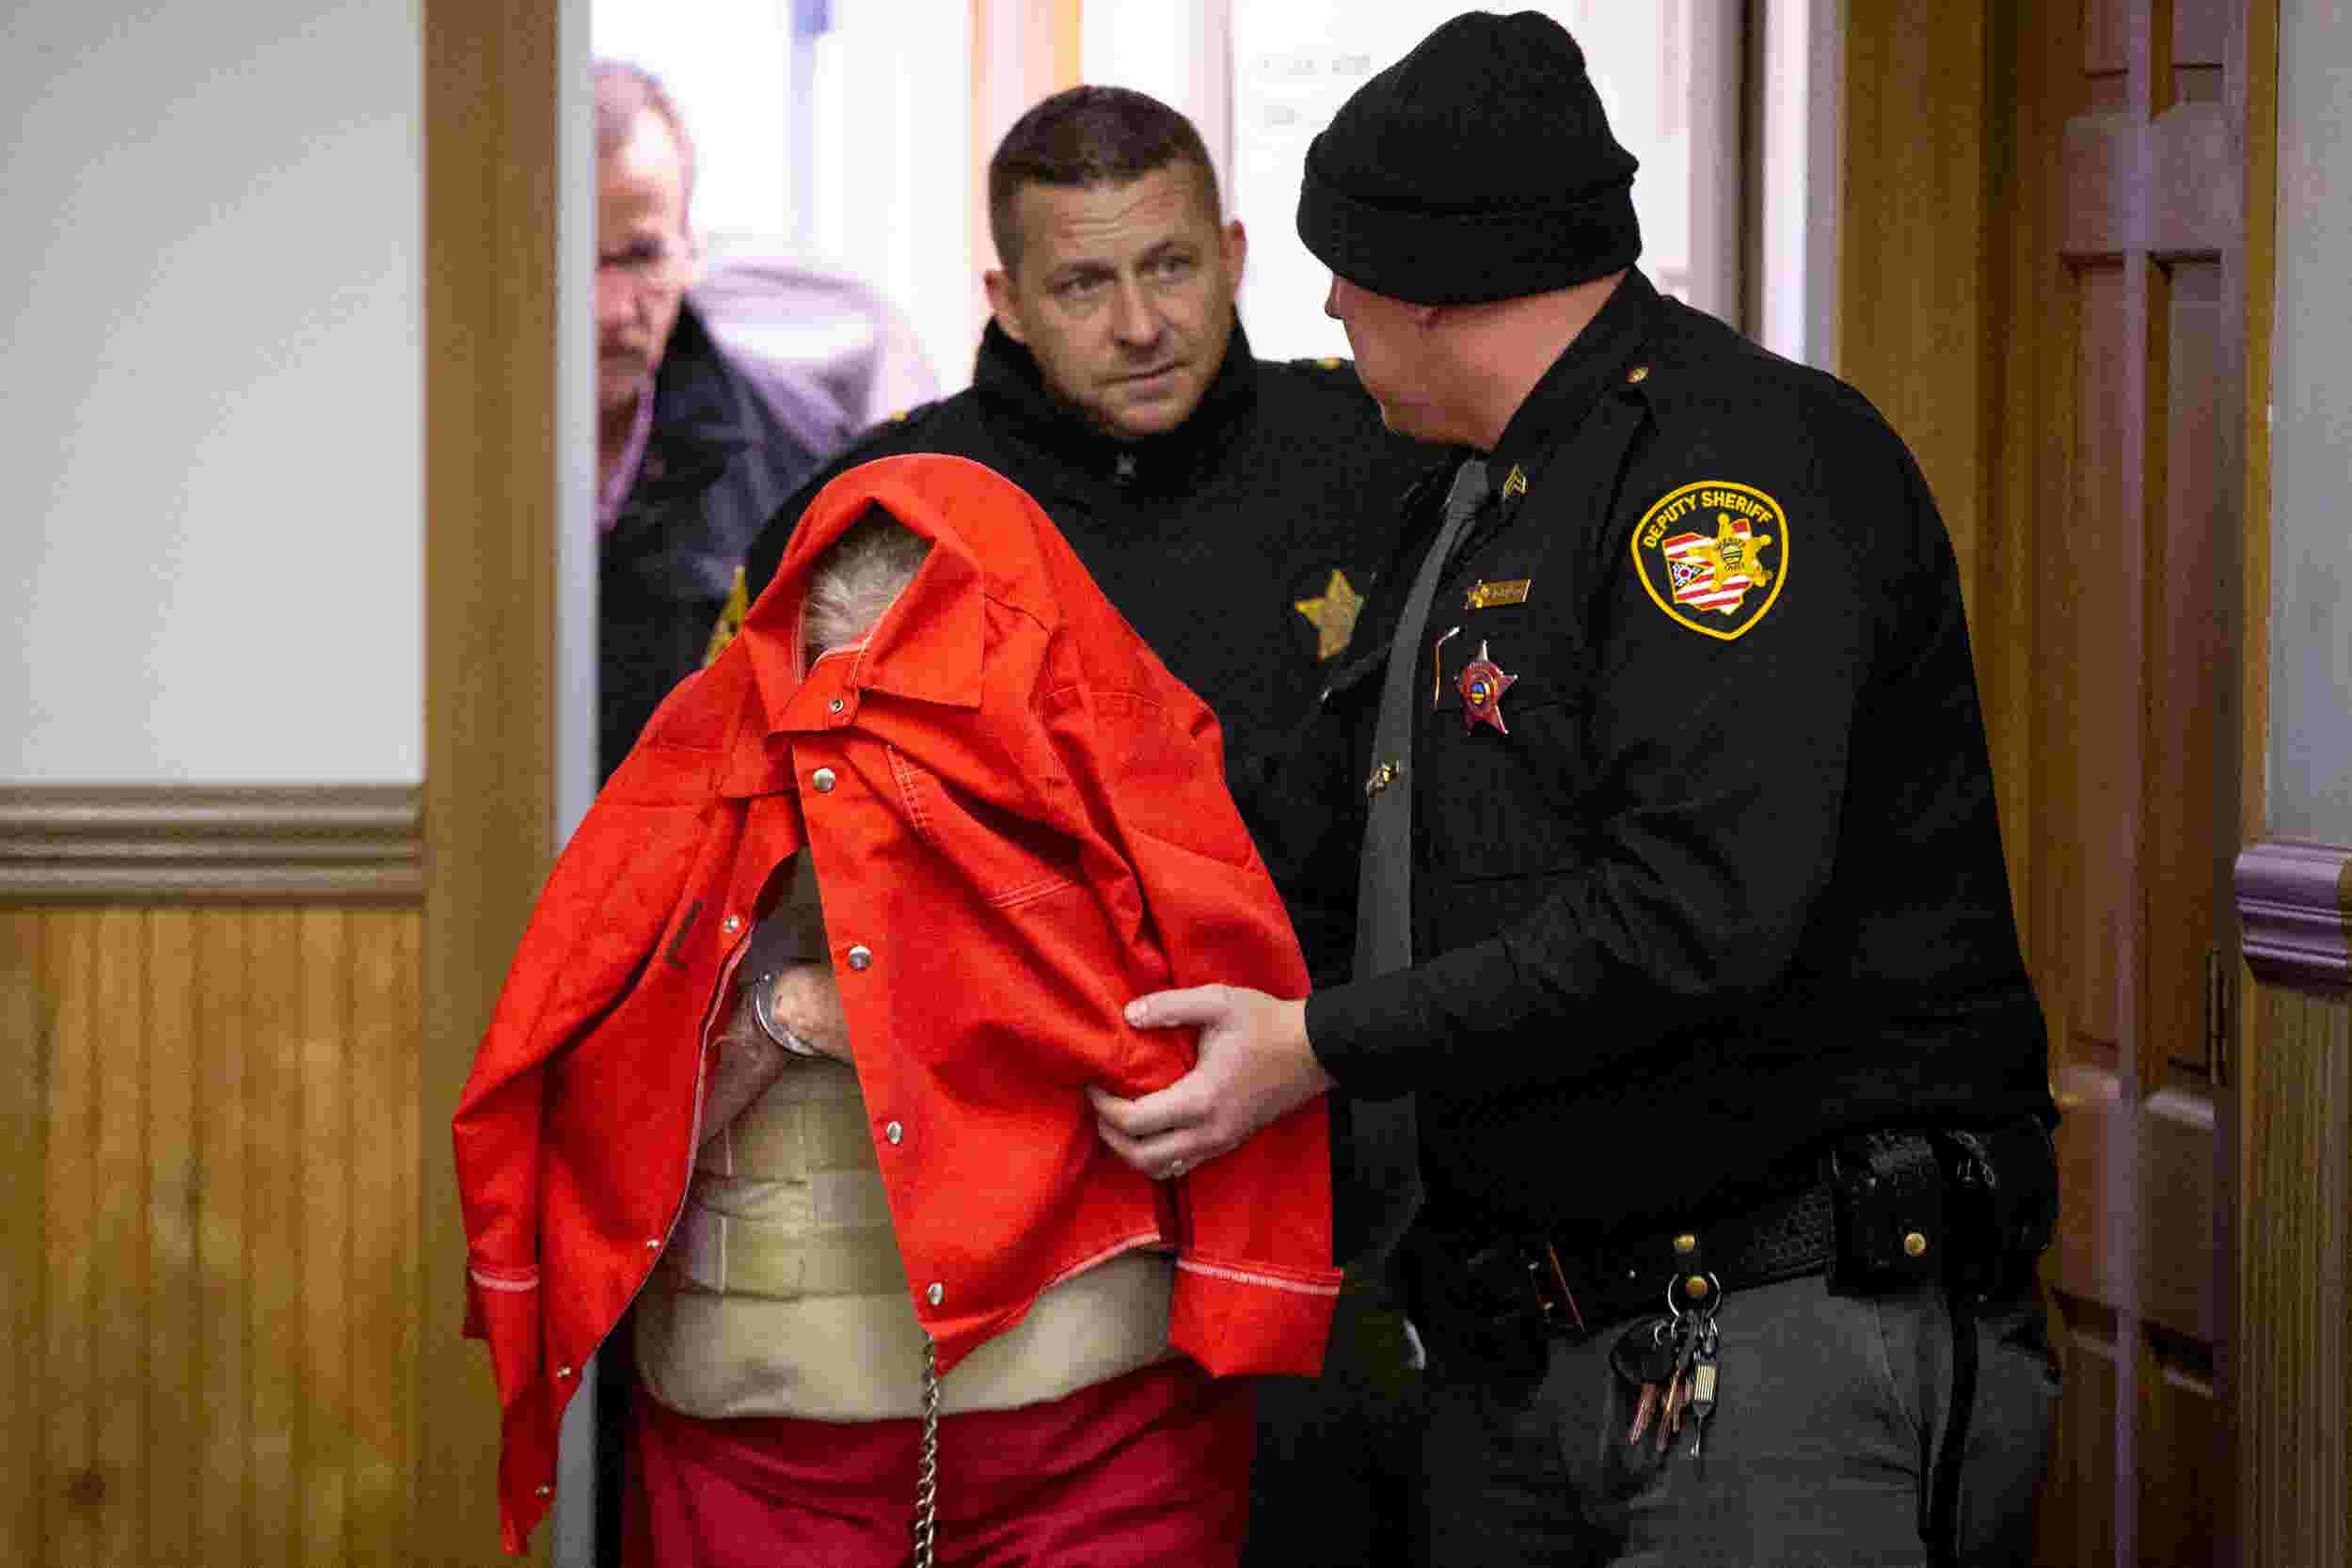 Fredericka Wagner arraignment